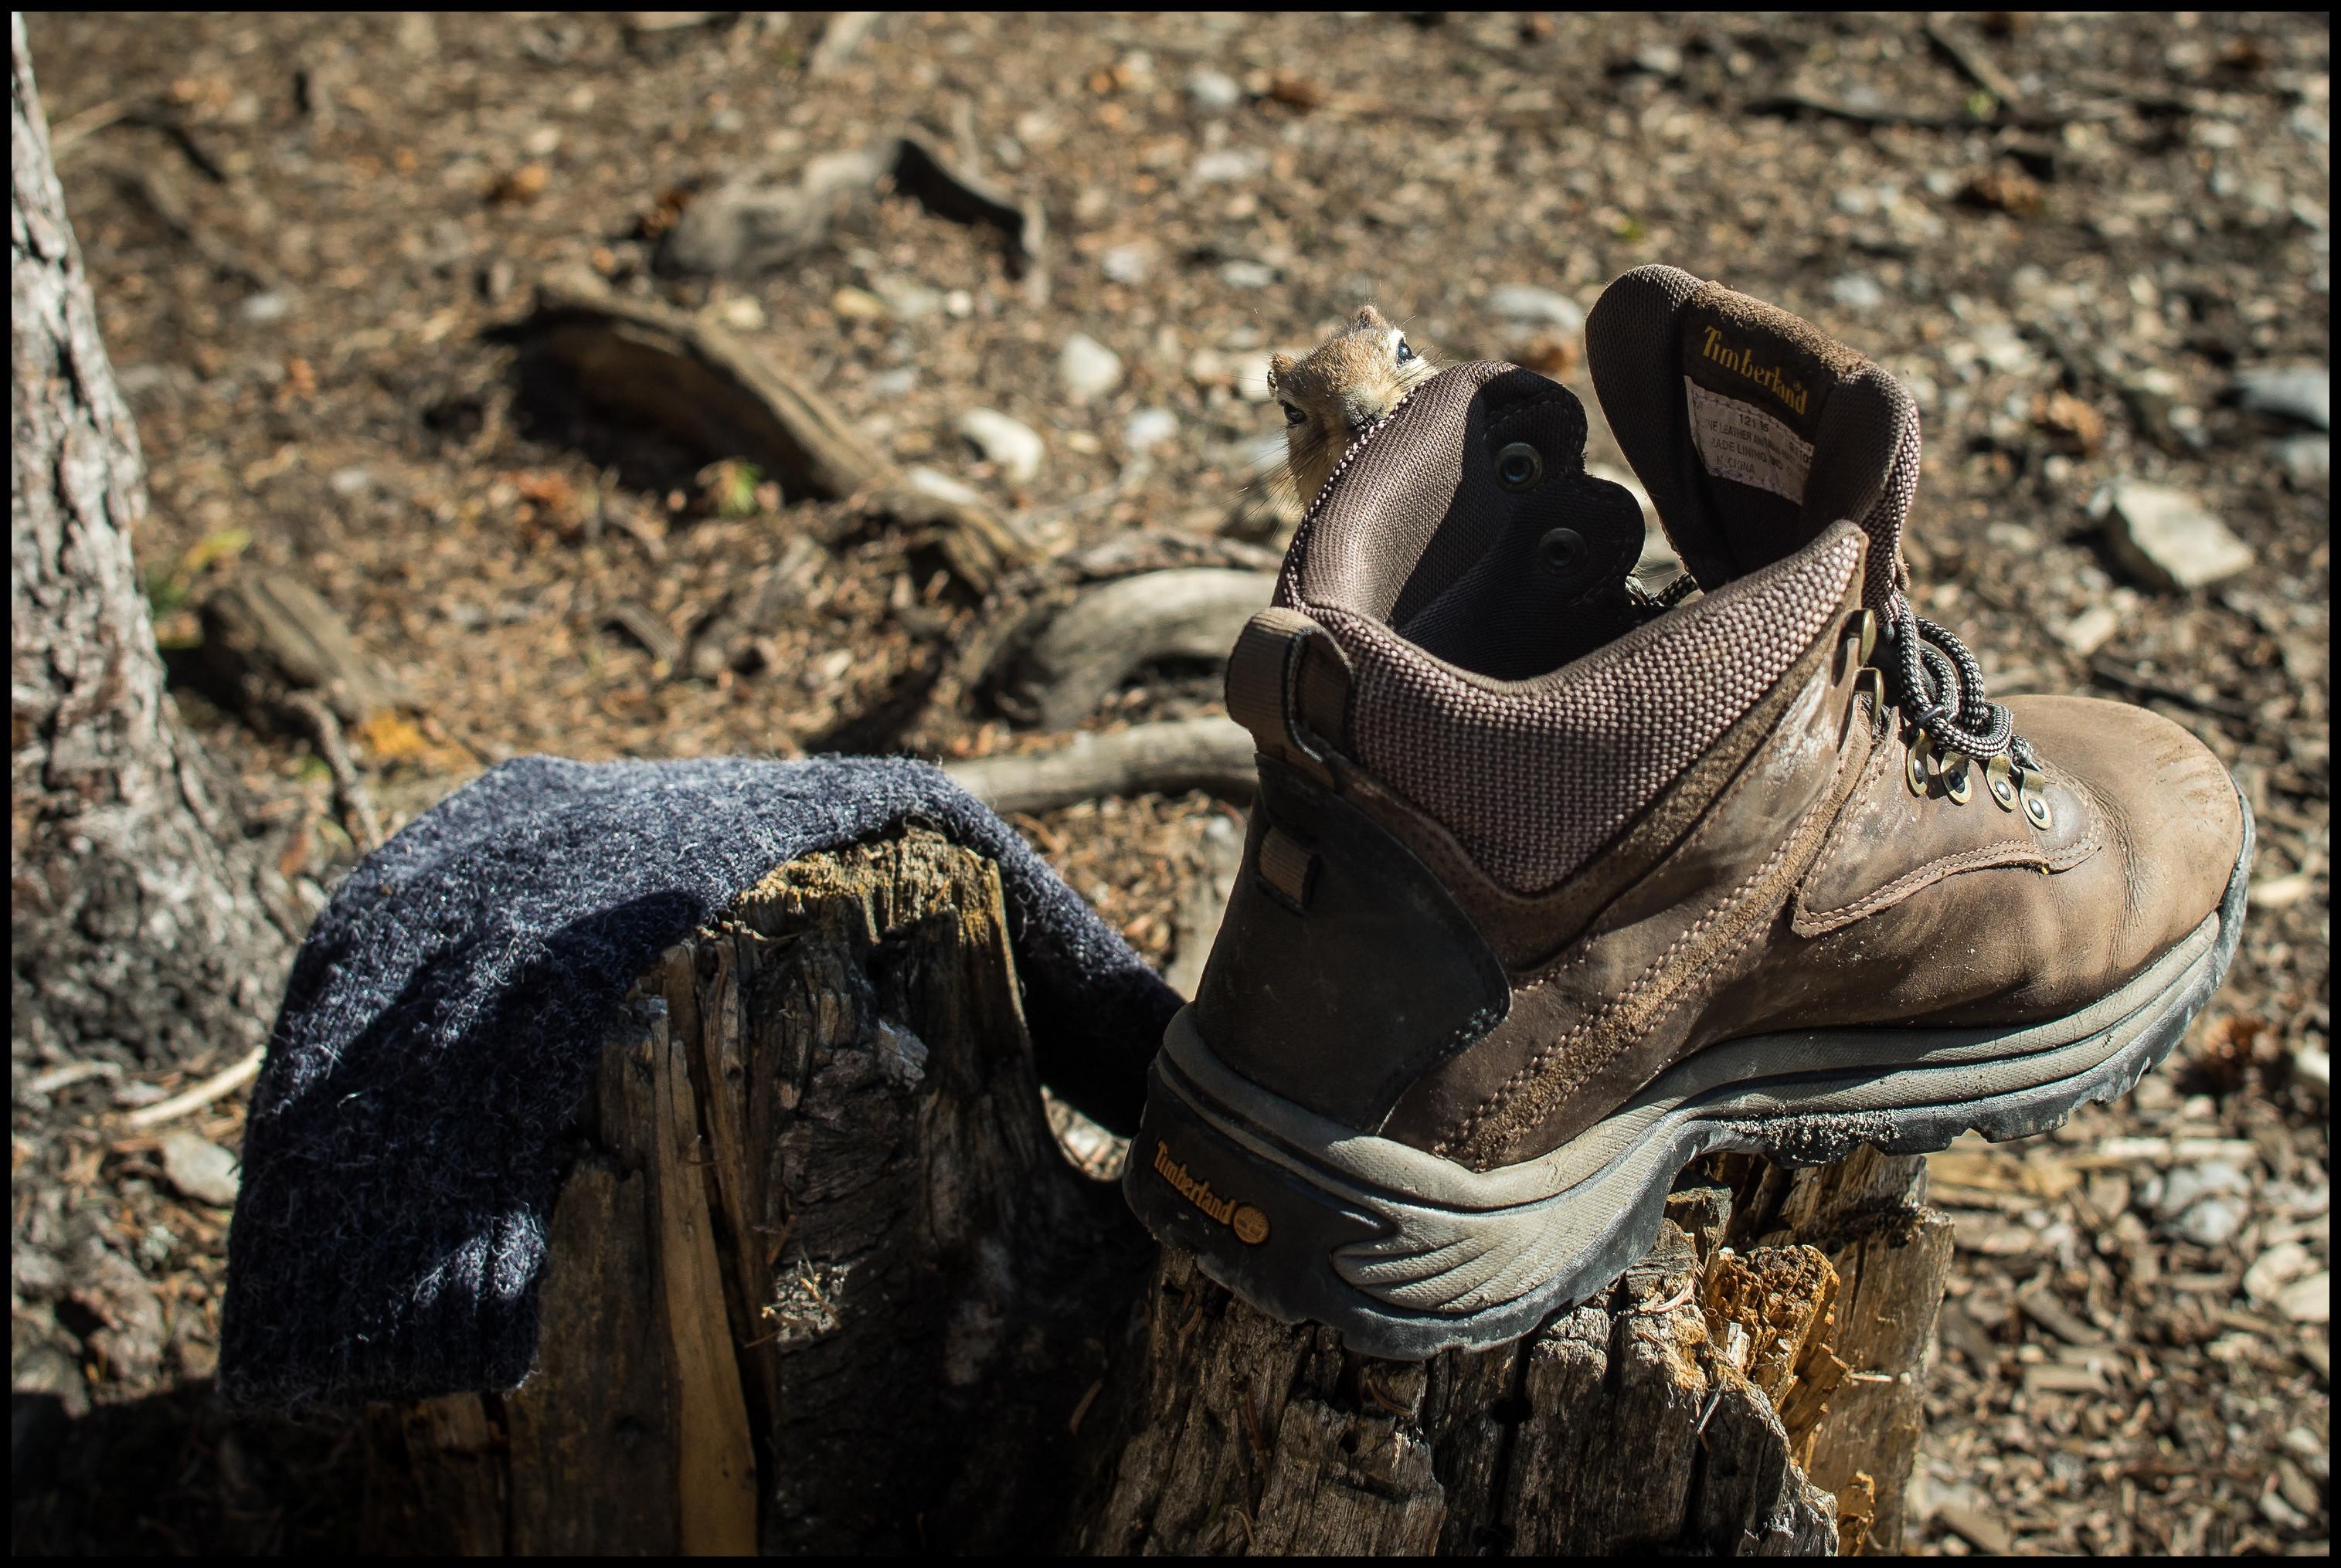 Ground squirrel salt lick, Berg Lake / Marmot campsite Sony A7 / Canon FD Tilt Shift 35 2.8